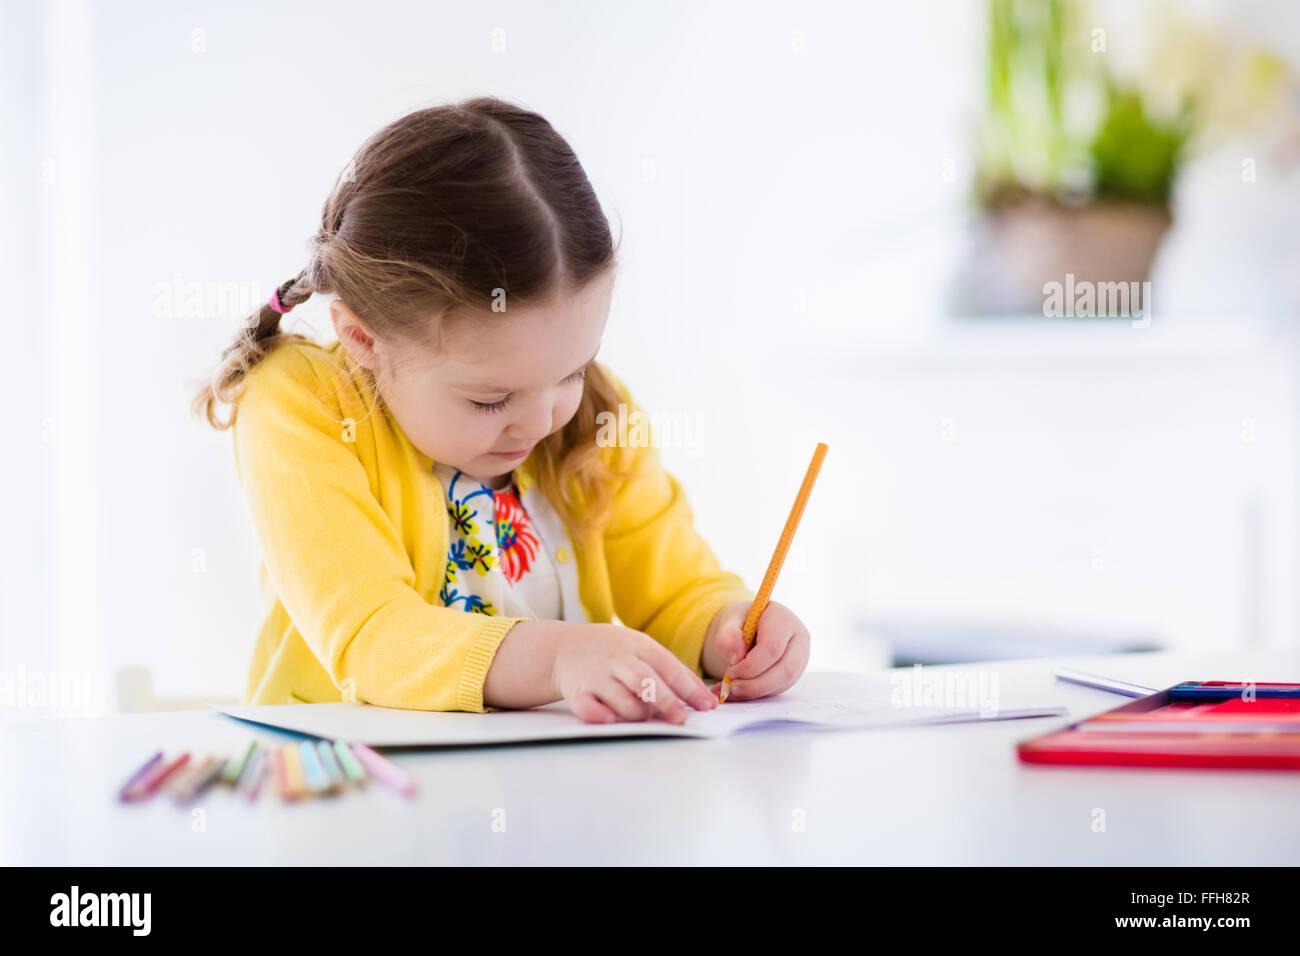 Kids Writing Funny Stockfotos & Kids Writing Funny Bilder - Alamy